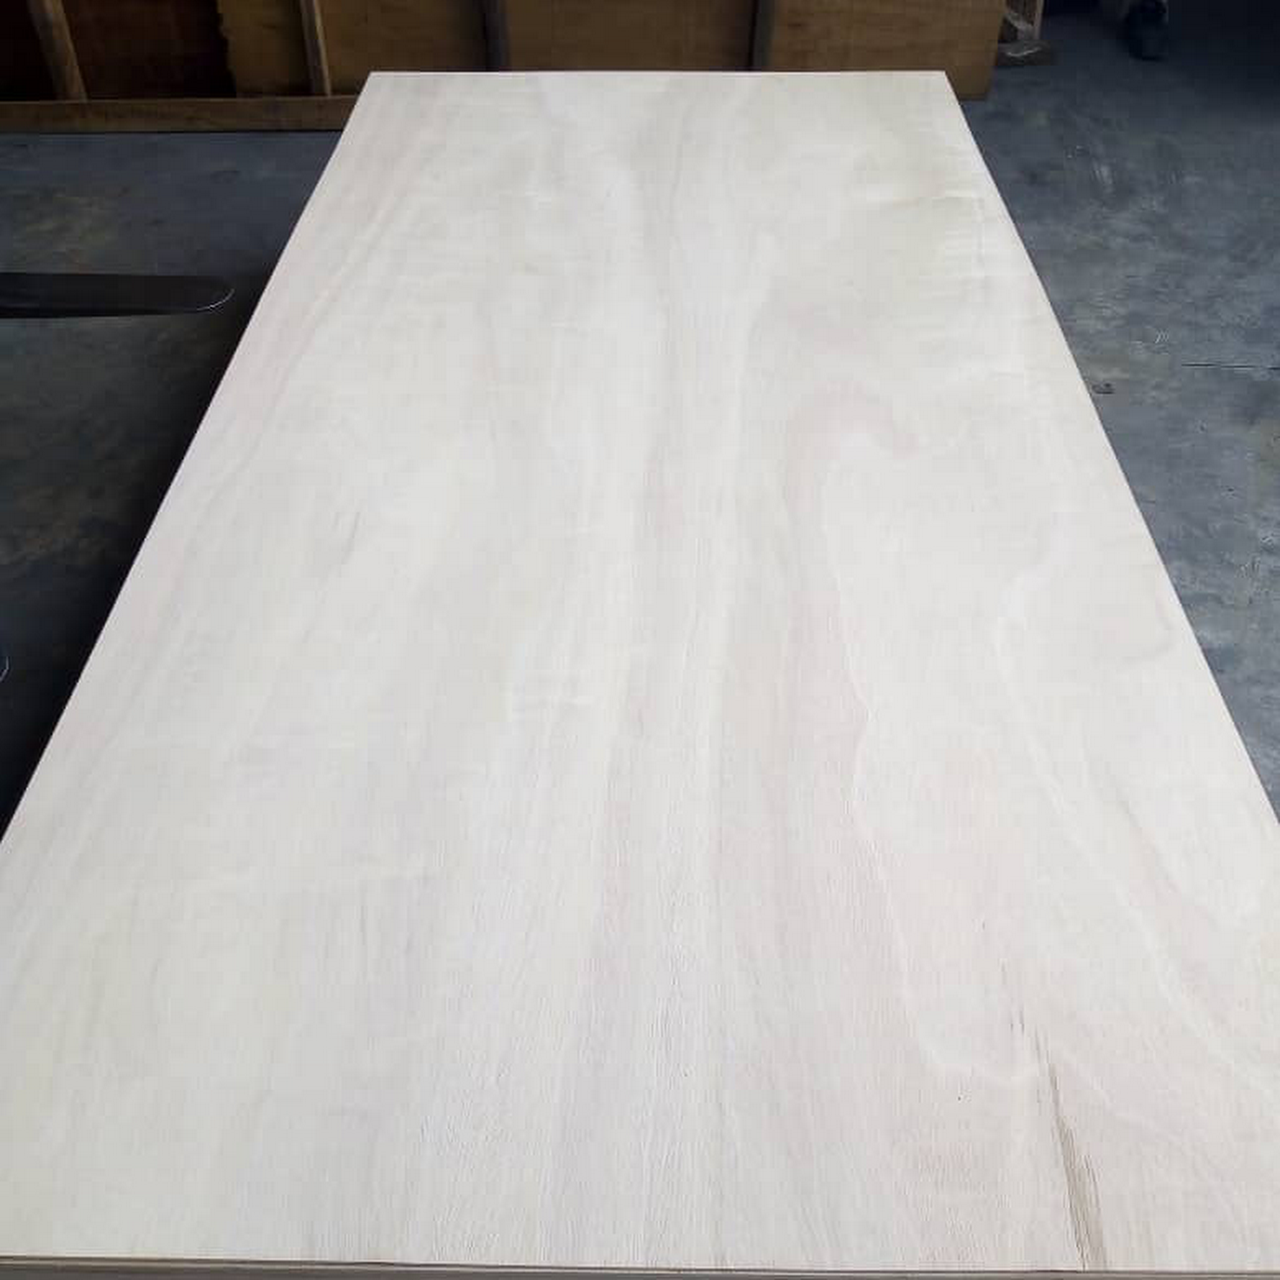 SHIN WII TRADING - Plywood Supplier in Tudan